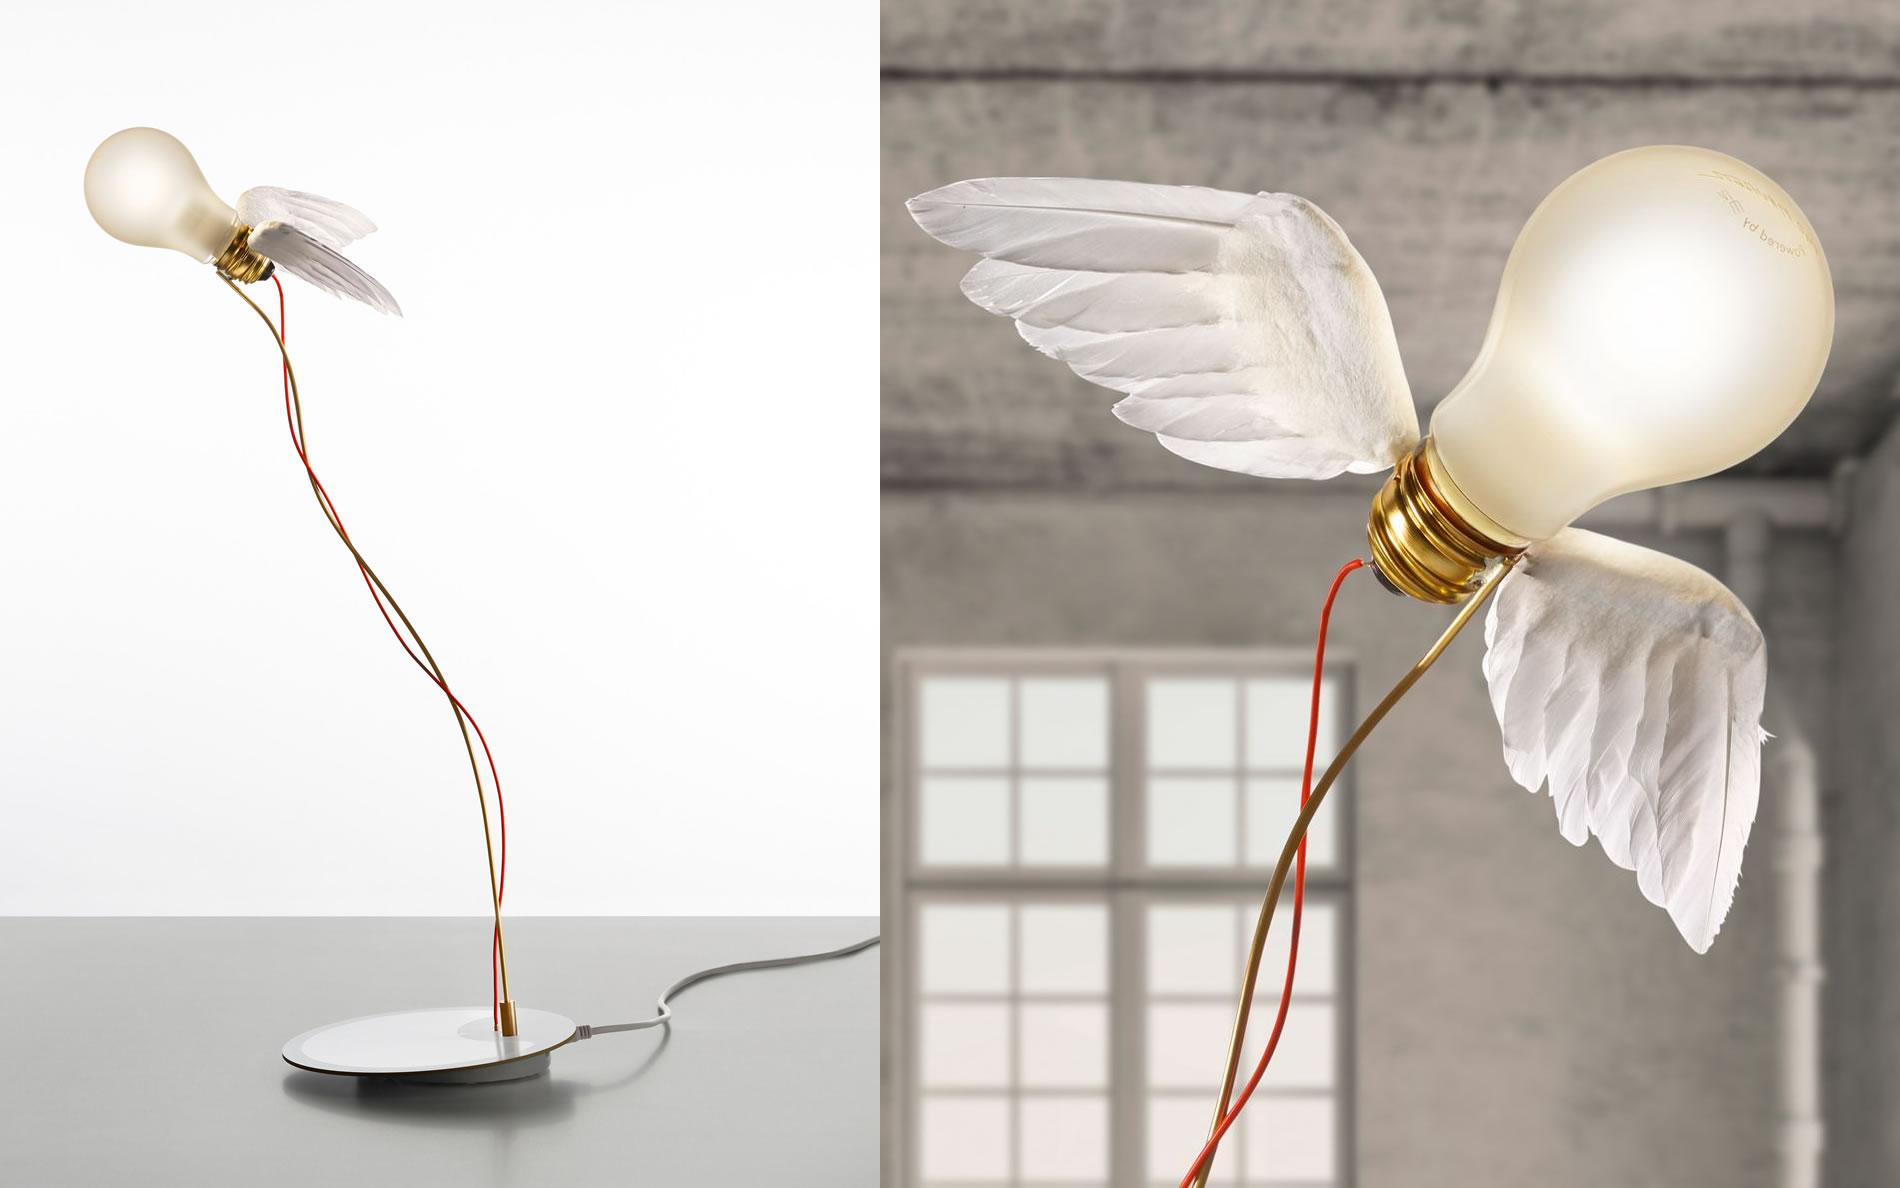 lucellino led ingo maurer lampada lucellino led ingo maurer lampada da tavolo lucellino led. Black Bedroom Furniture Sets. Home Design Ideas